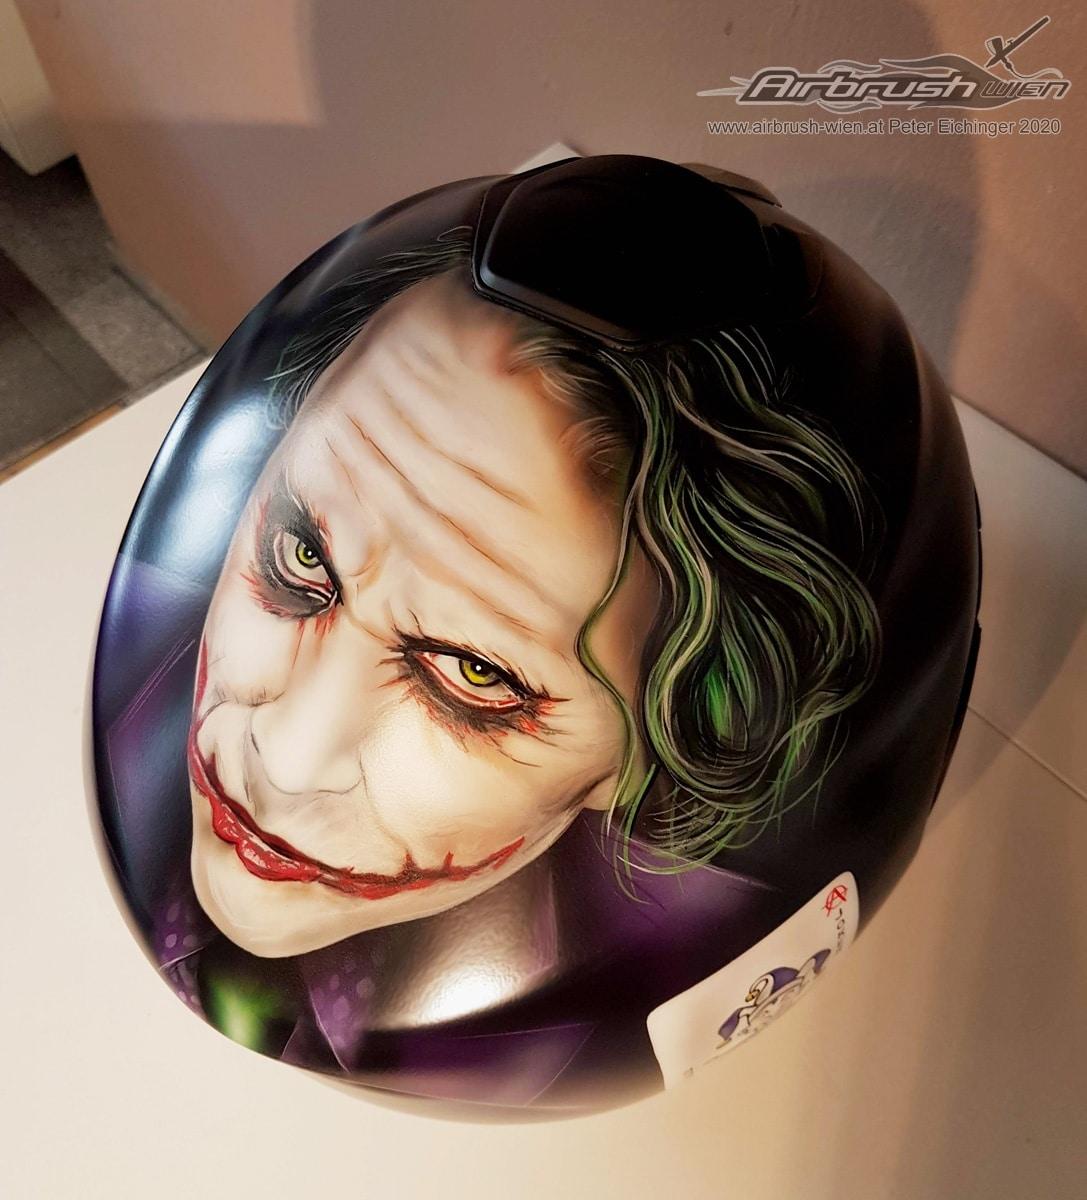 The Joker Helm